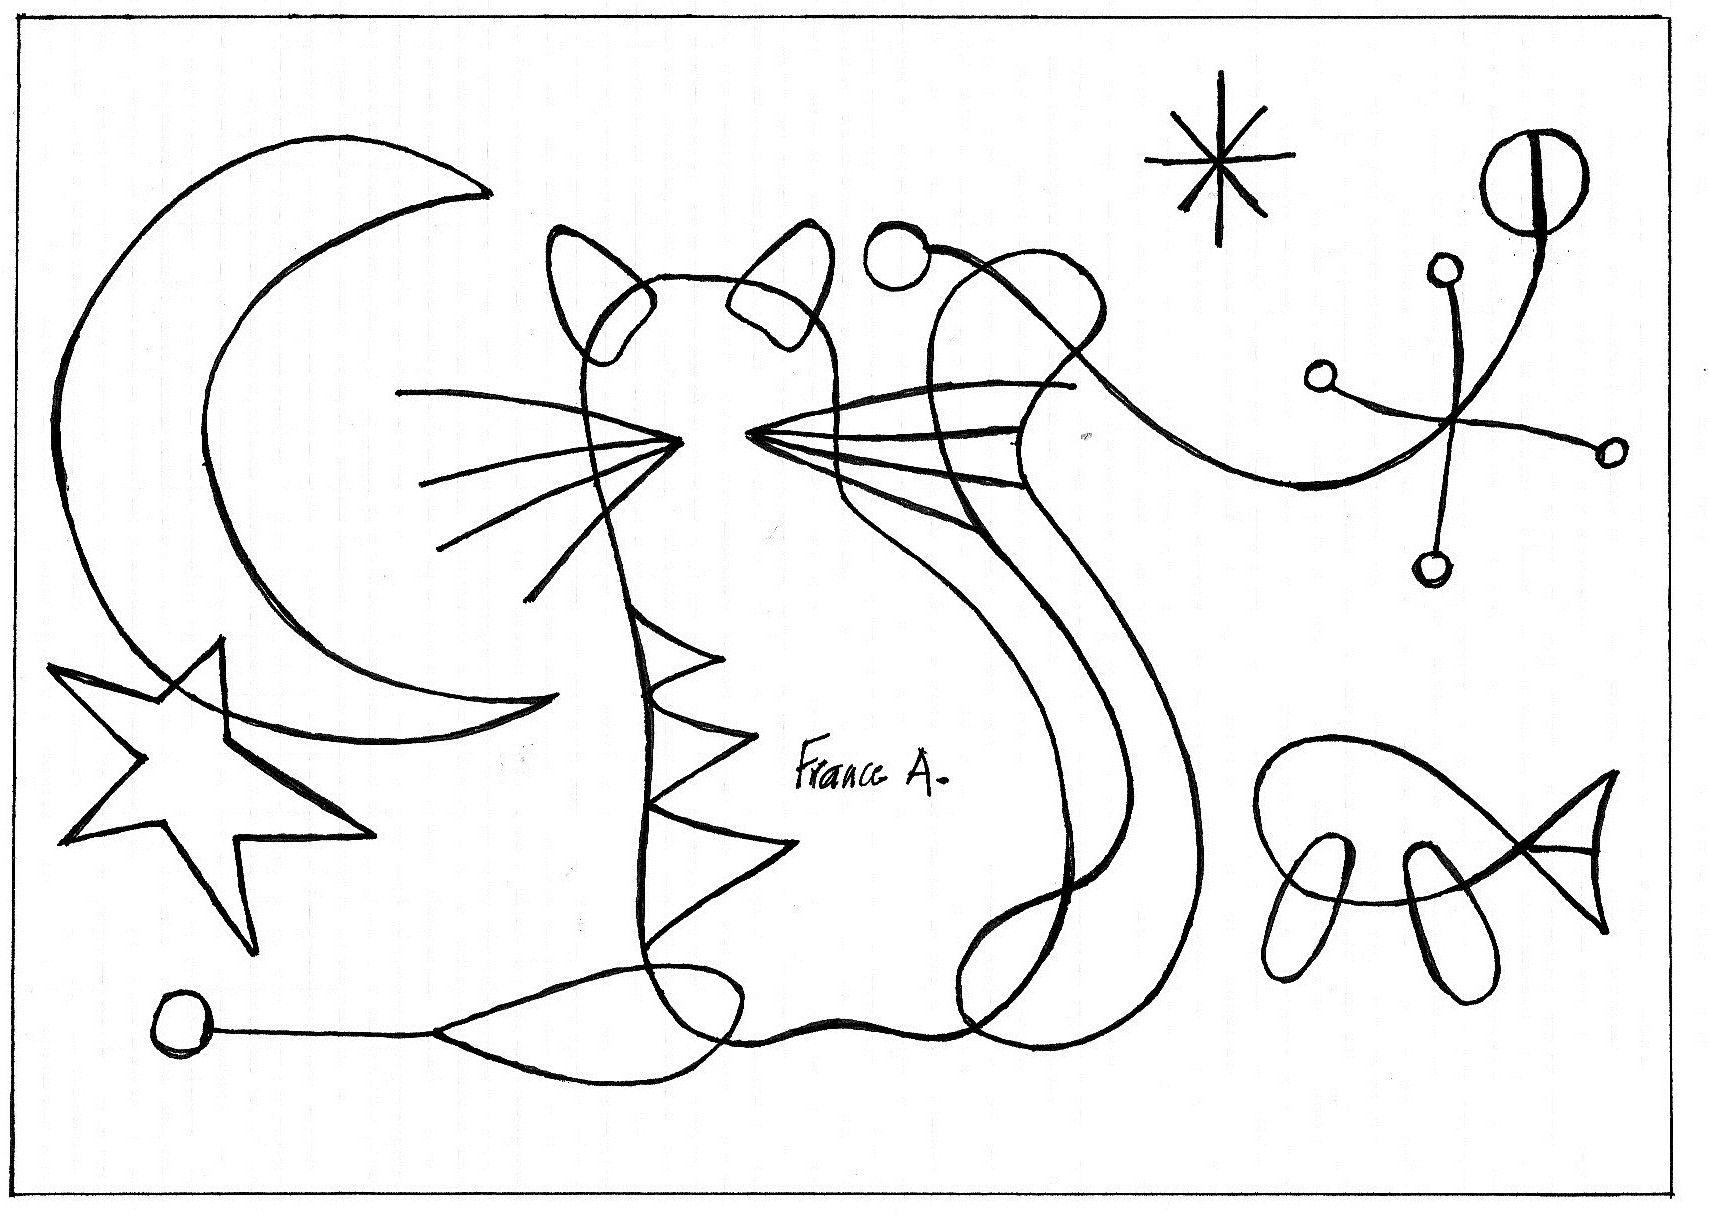 Pin By Doodledougdesign On Doodle Doug Draw